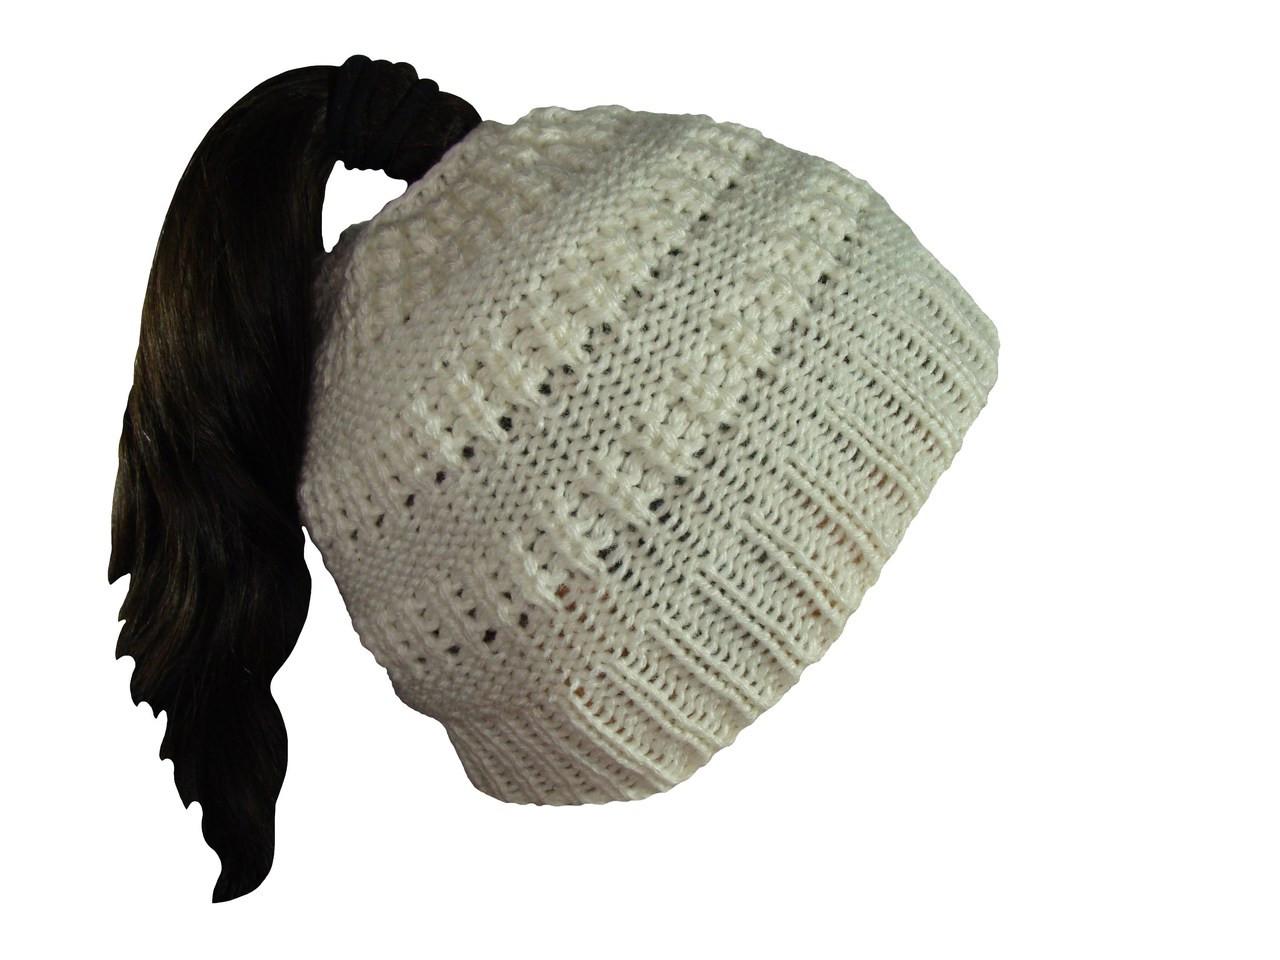 3811dd1b36e35 ... Ponytail Messy Bun Knitted Ponytail Winter Beanie Crocheted in 100%  Alpaca